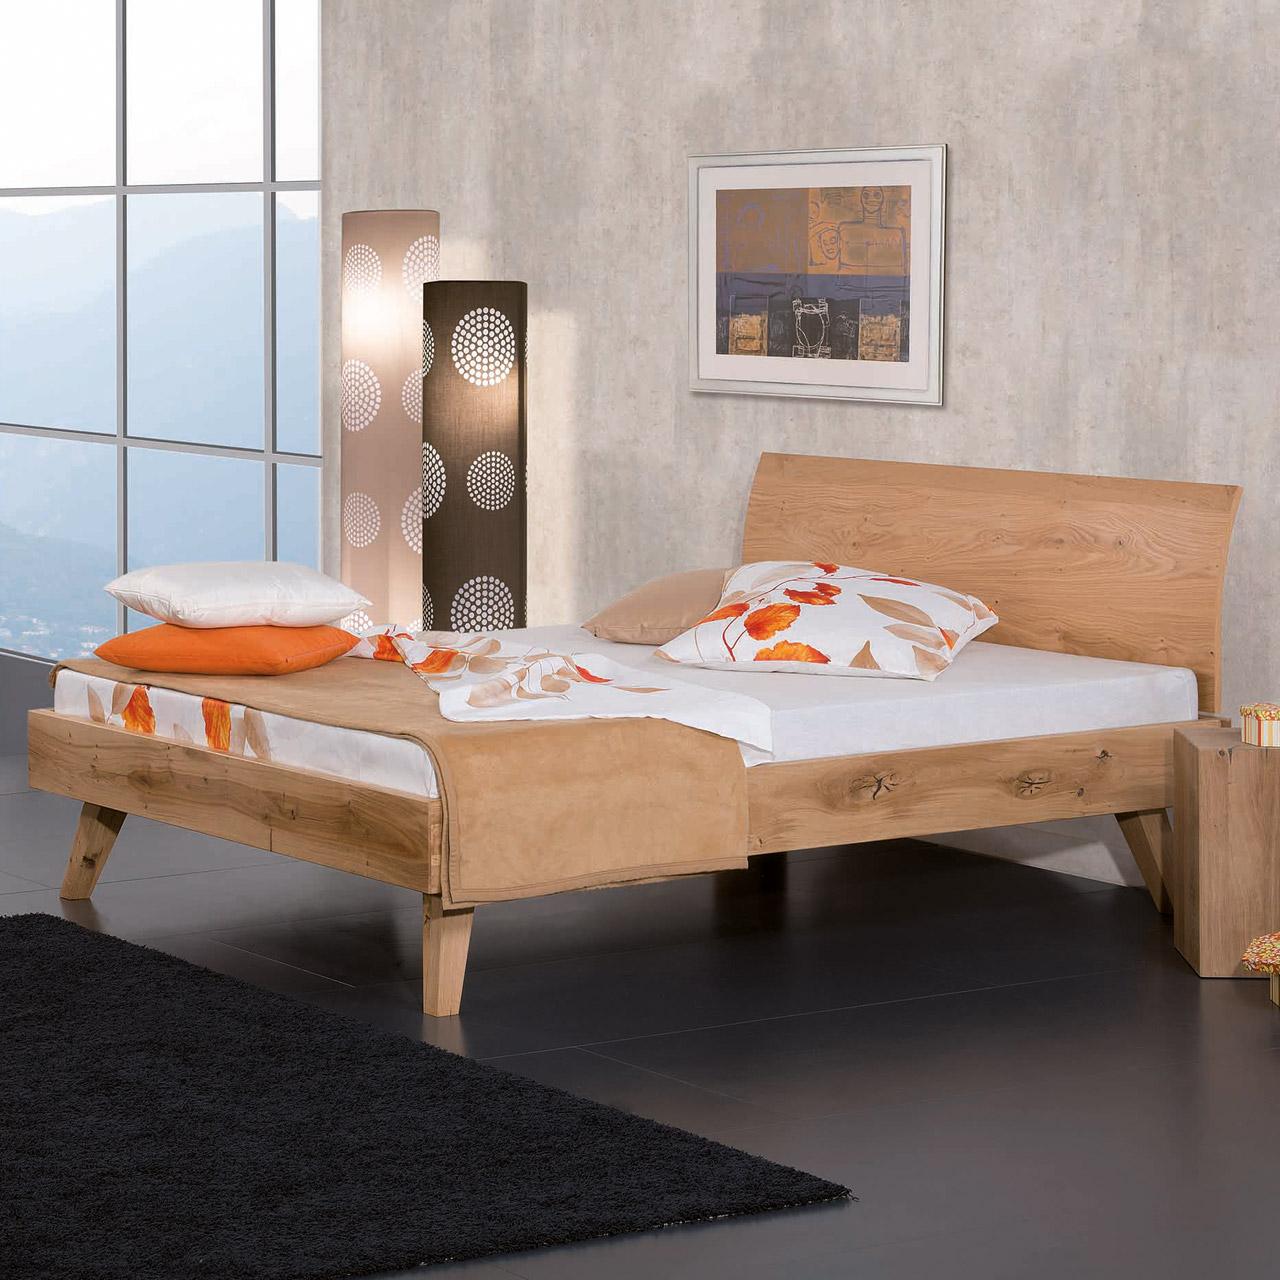 massivholzbett g nstig online kaufen matratzen. Black Bedroom Furniture Sets. Home Design Ideas